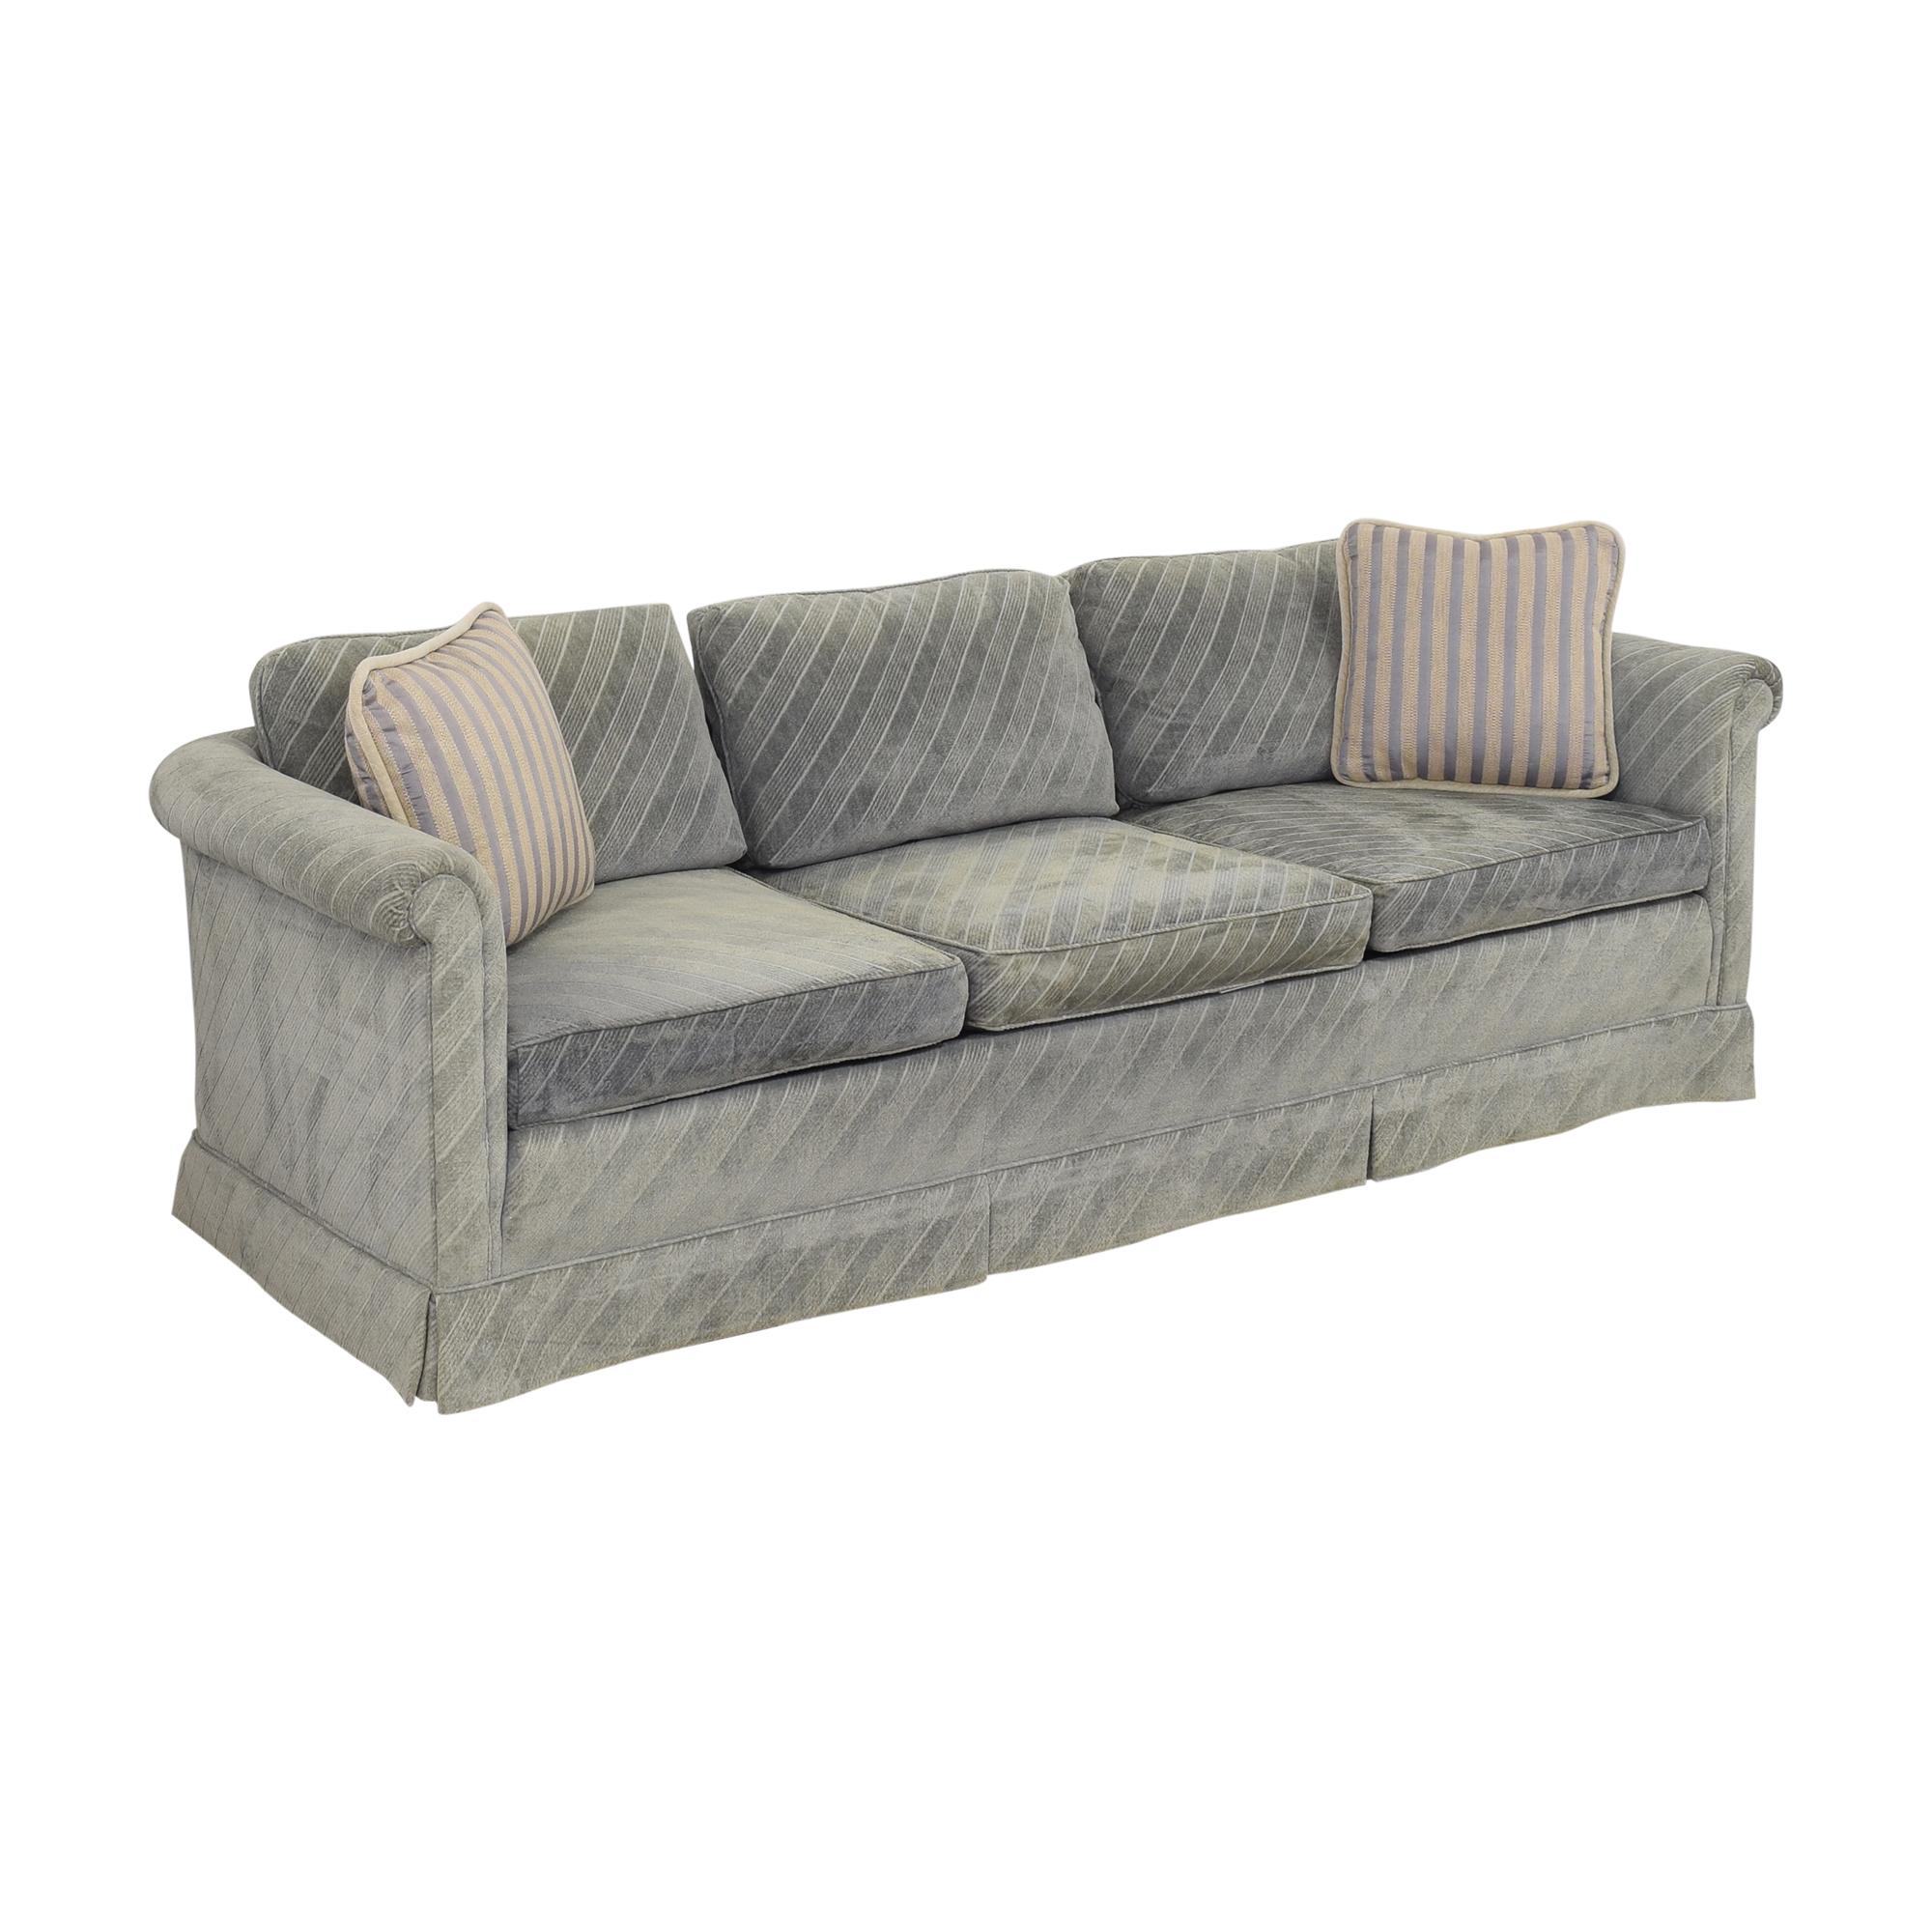 Baker Furniture Historic Charleston Roll Arm Sofa / Sofas